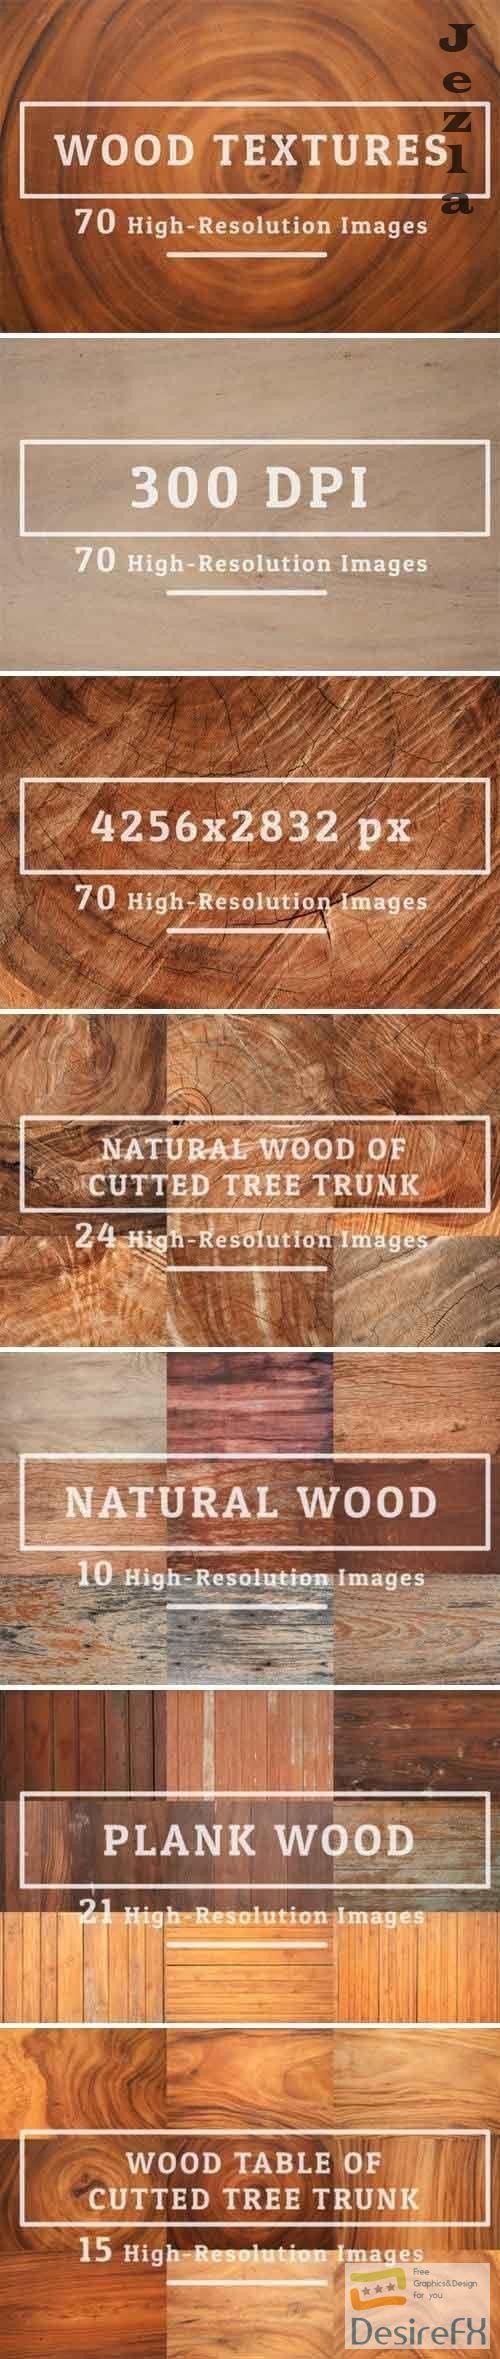 70 Wood Texture Background Set 08 679359